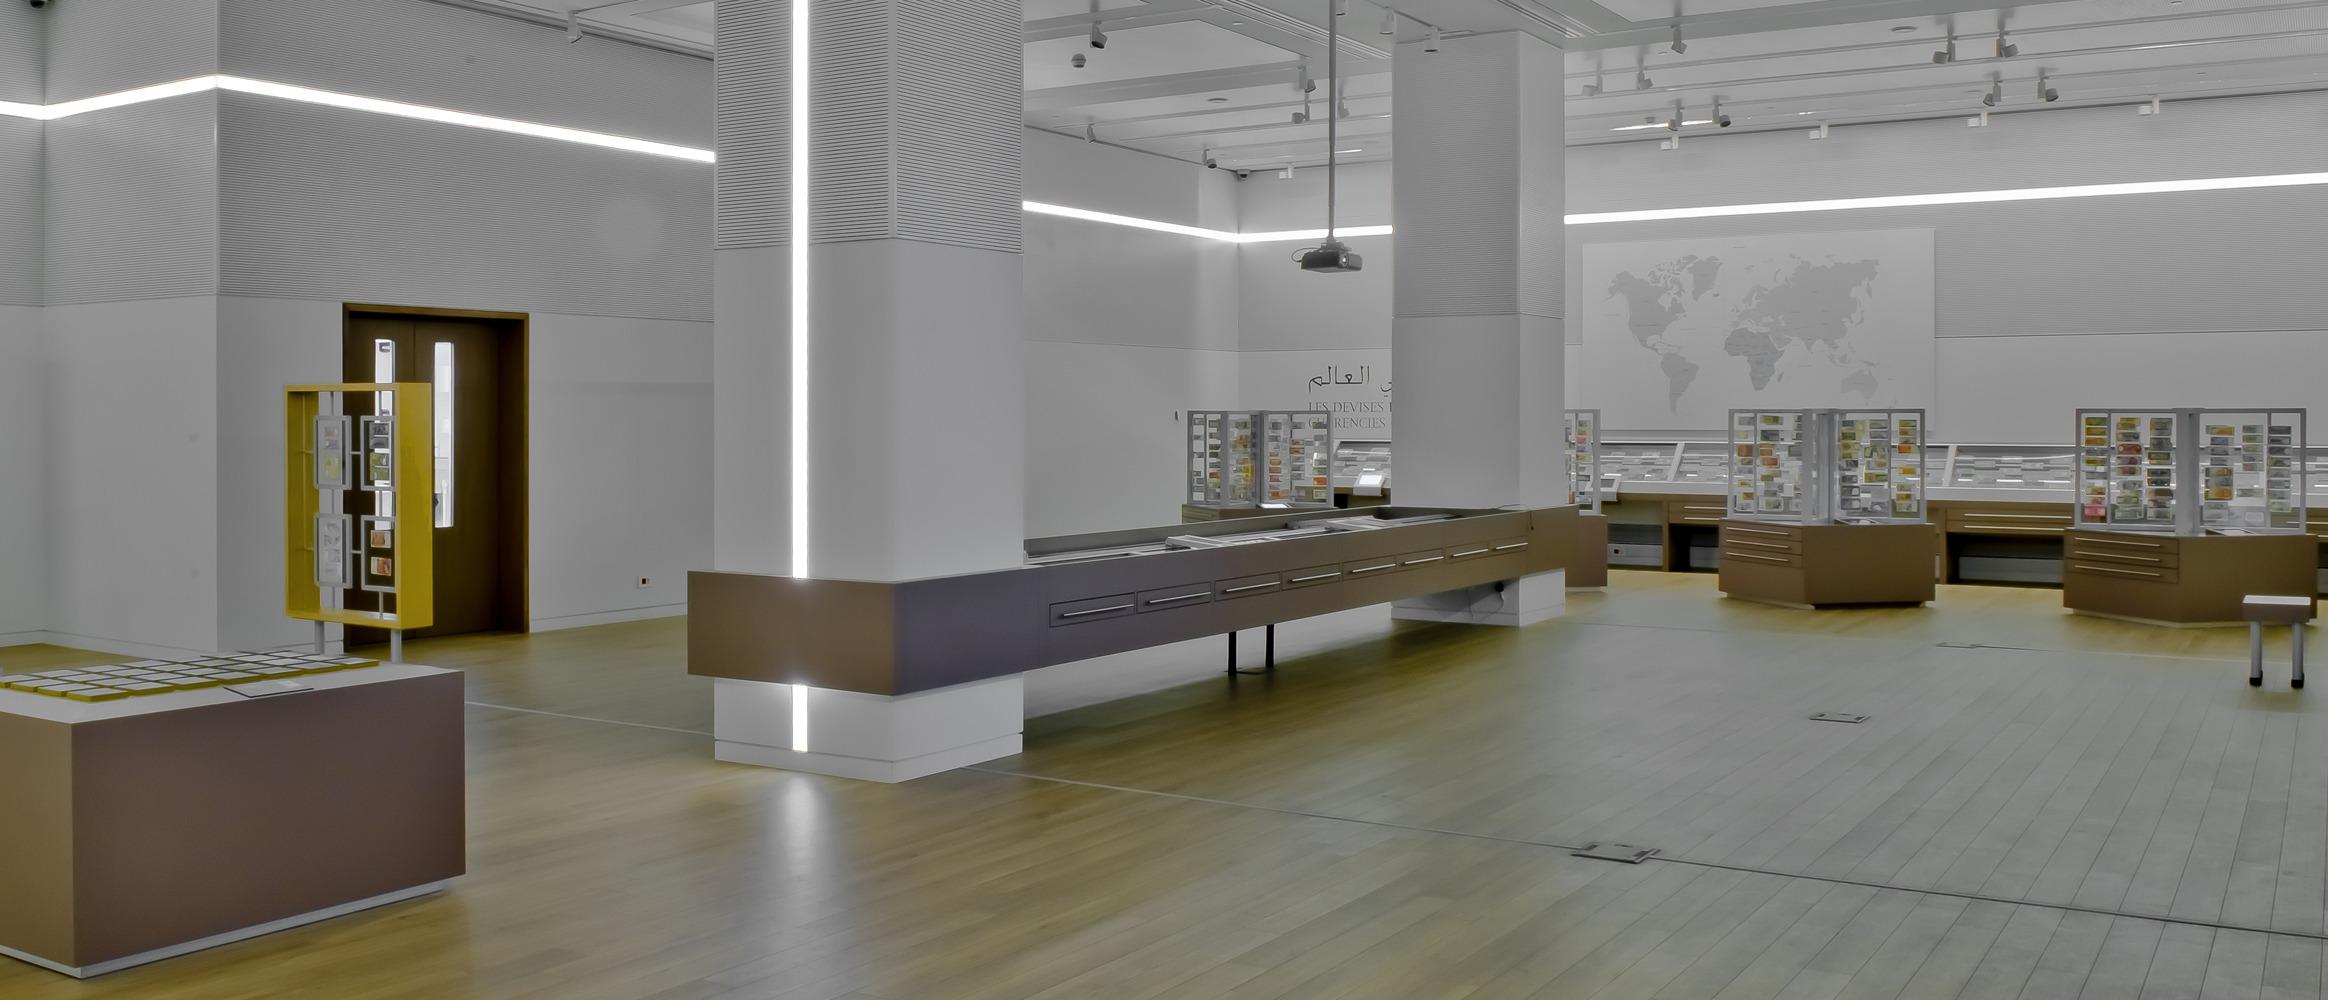 BANQUE DU LIBAN (BDL) MUSEUM